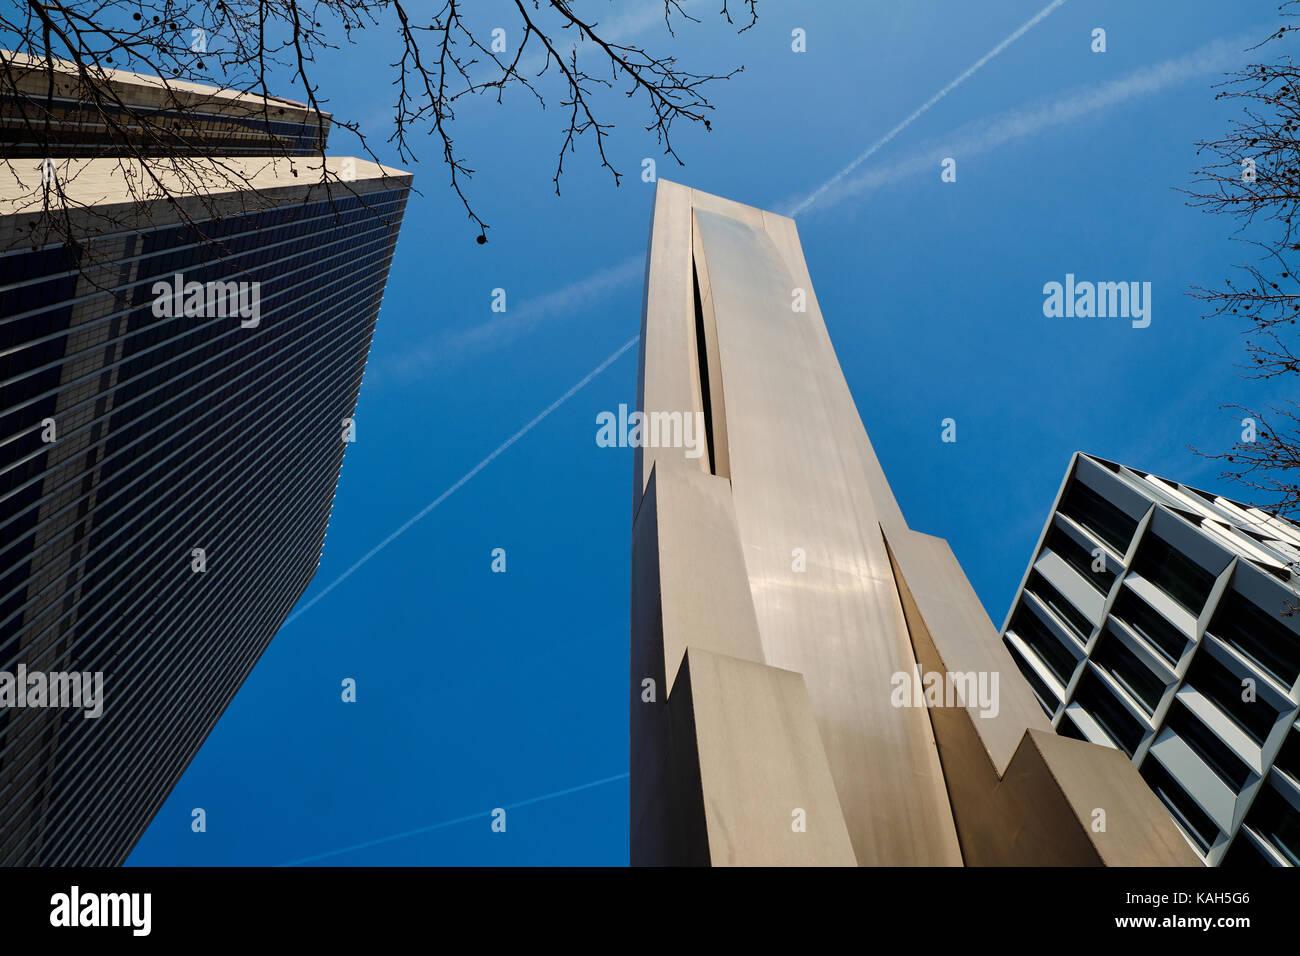 Frankfurt am Main, Germany - March 16, 2017: Lower view of modernist building sculpture next to Frankfurter Büro Stock Photo